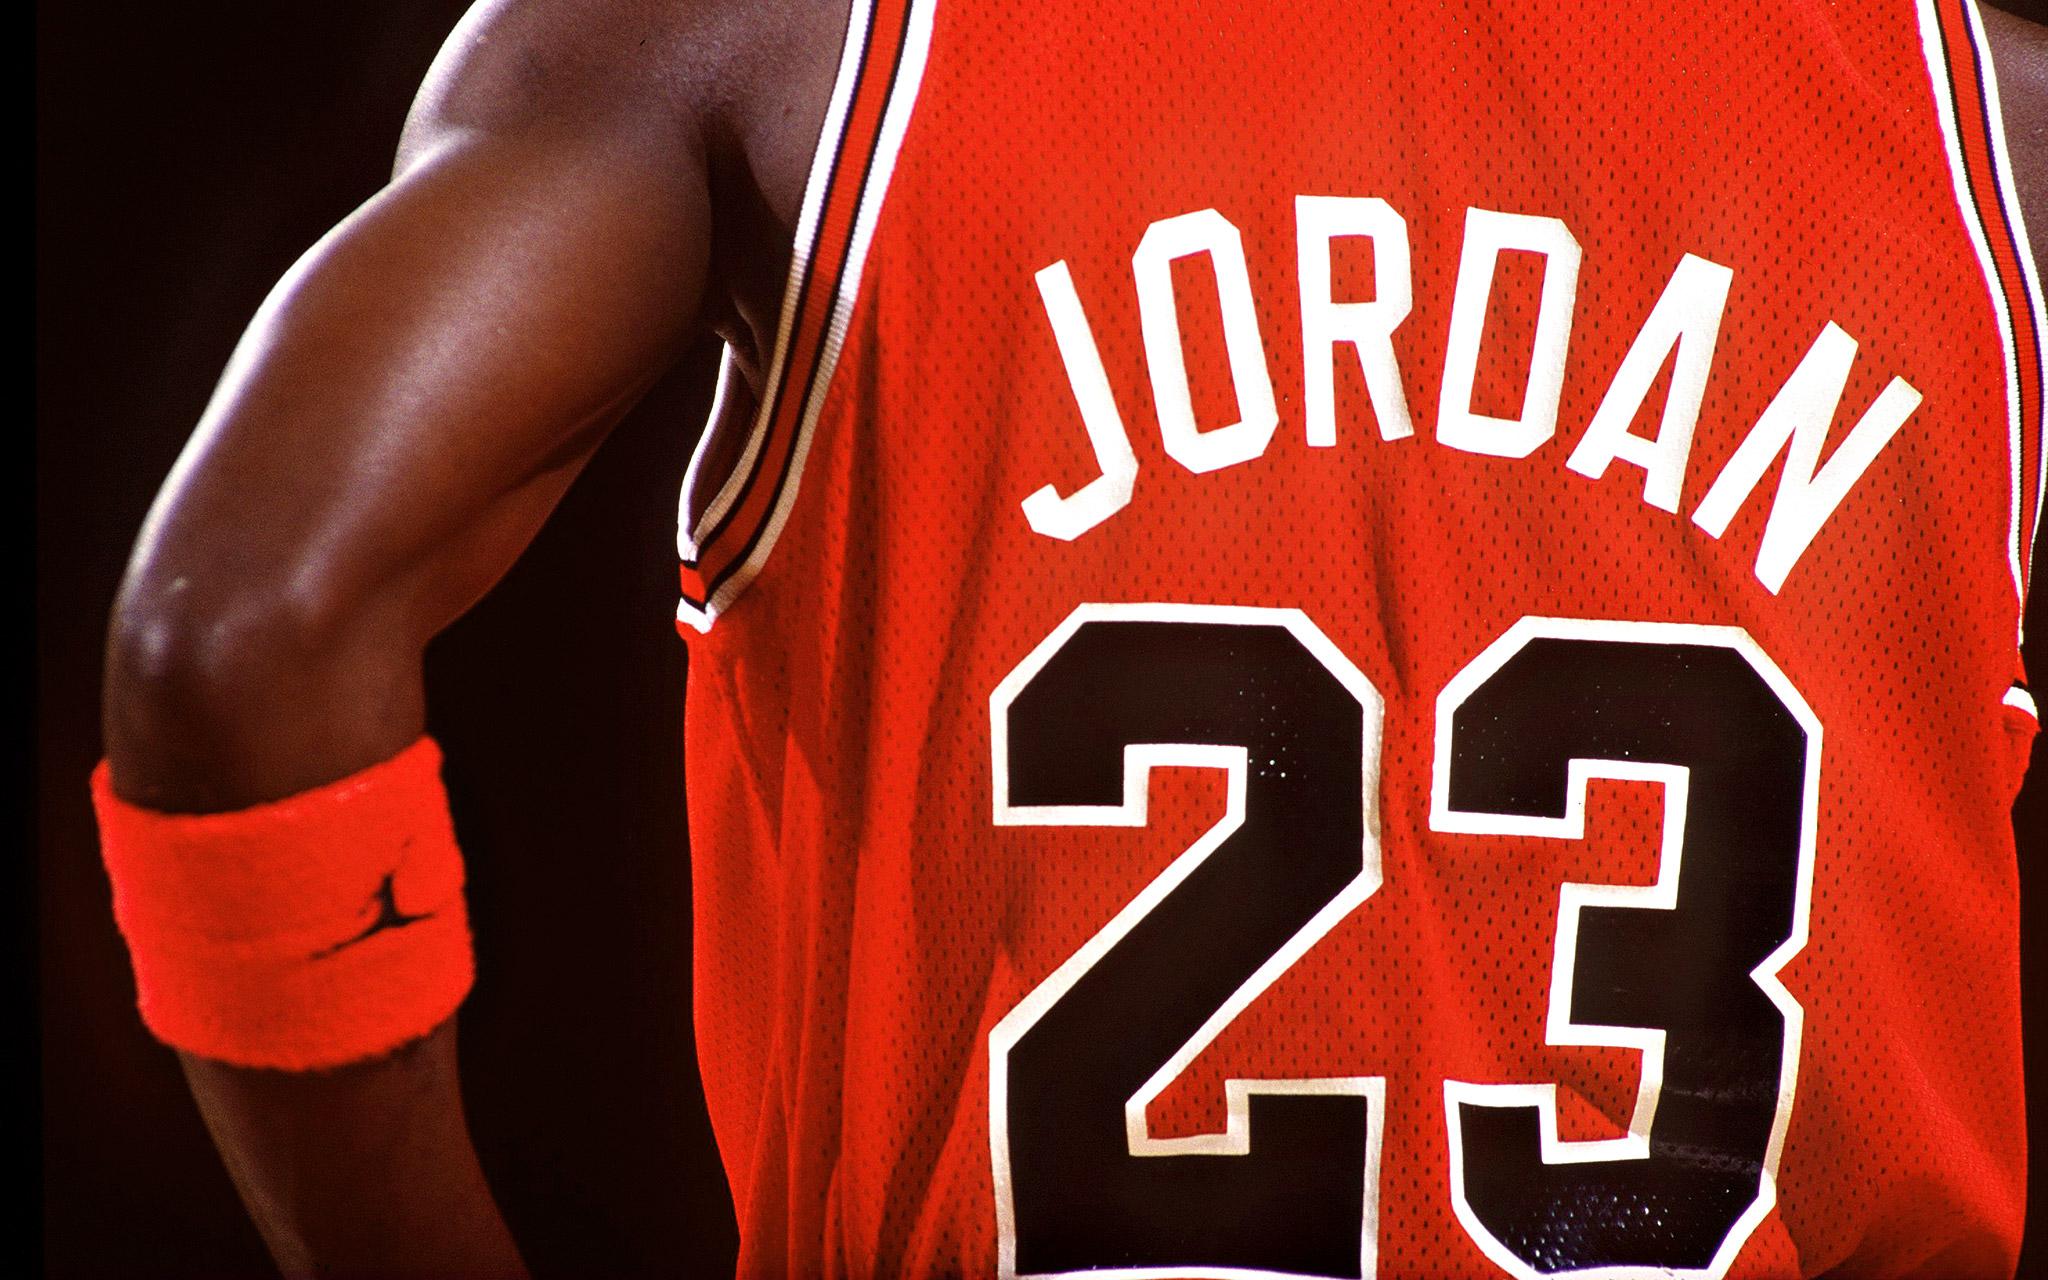 Michael Jordan Jersey 23 Wallpaper 2048x1280